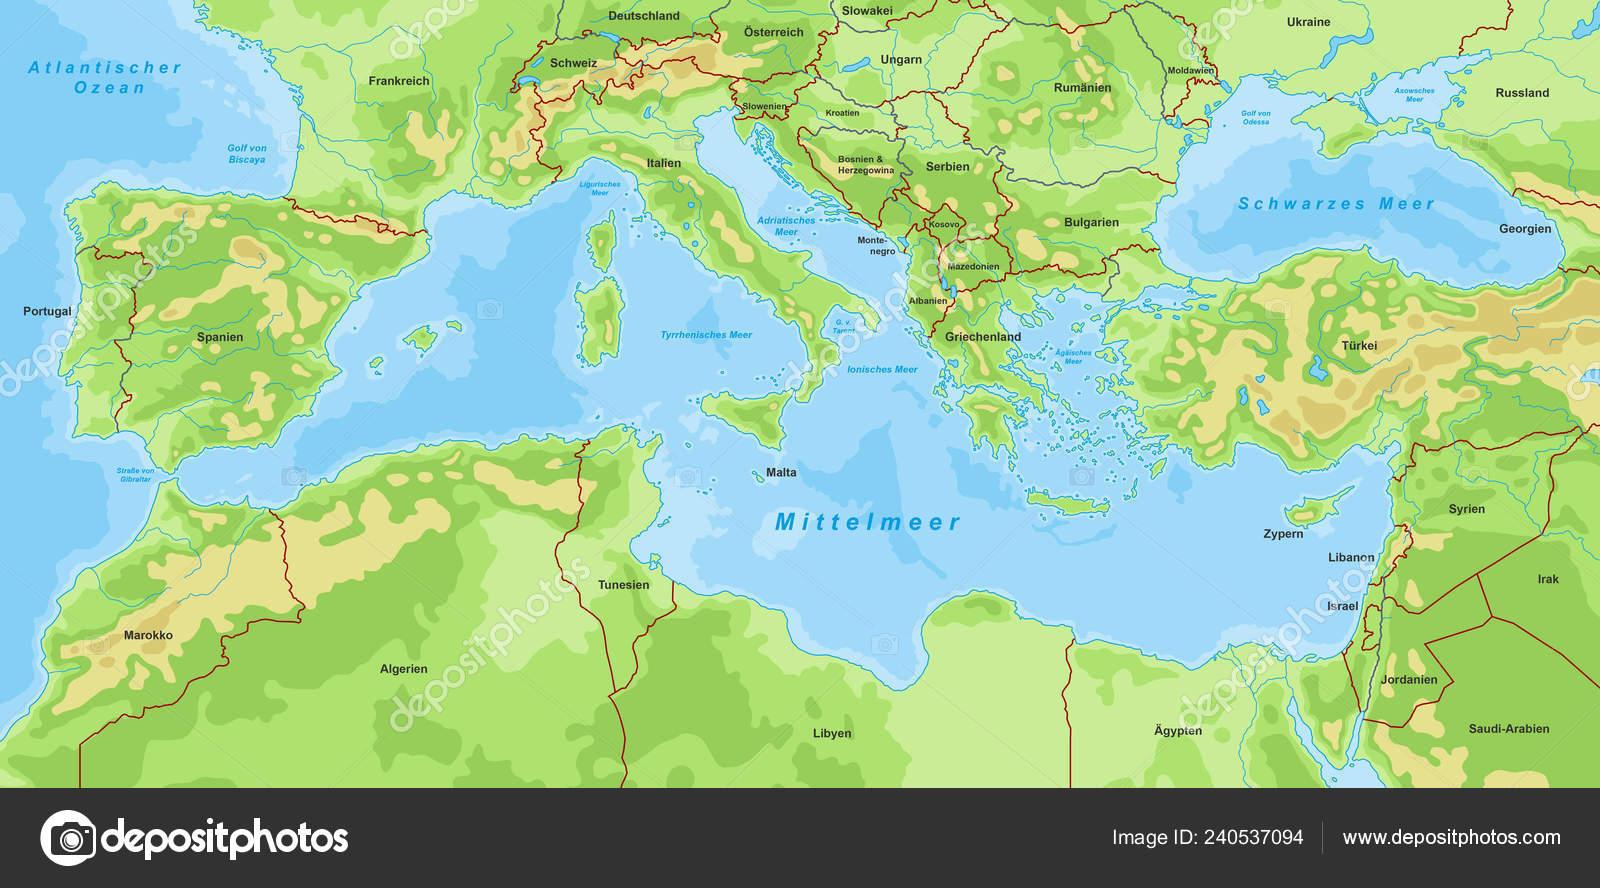 Mittelmeer Karte.Karte Von Mittelmeer Stockvektor Ii Graphics 240537094